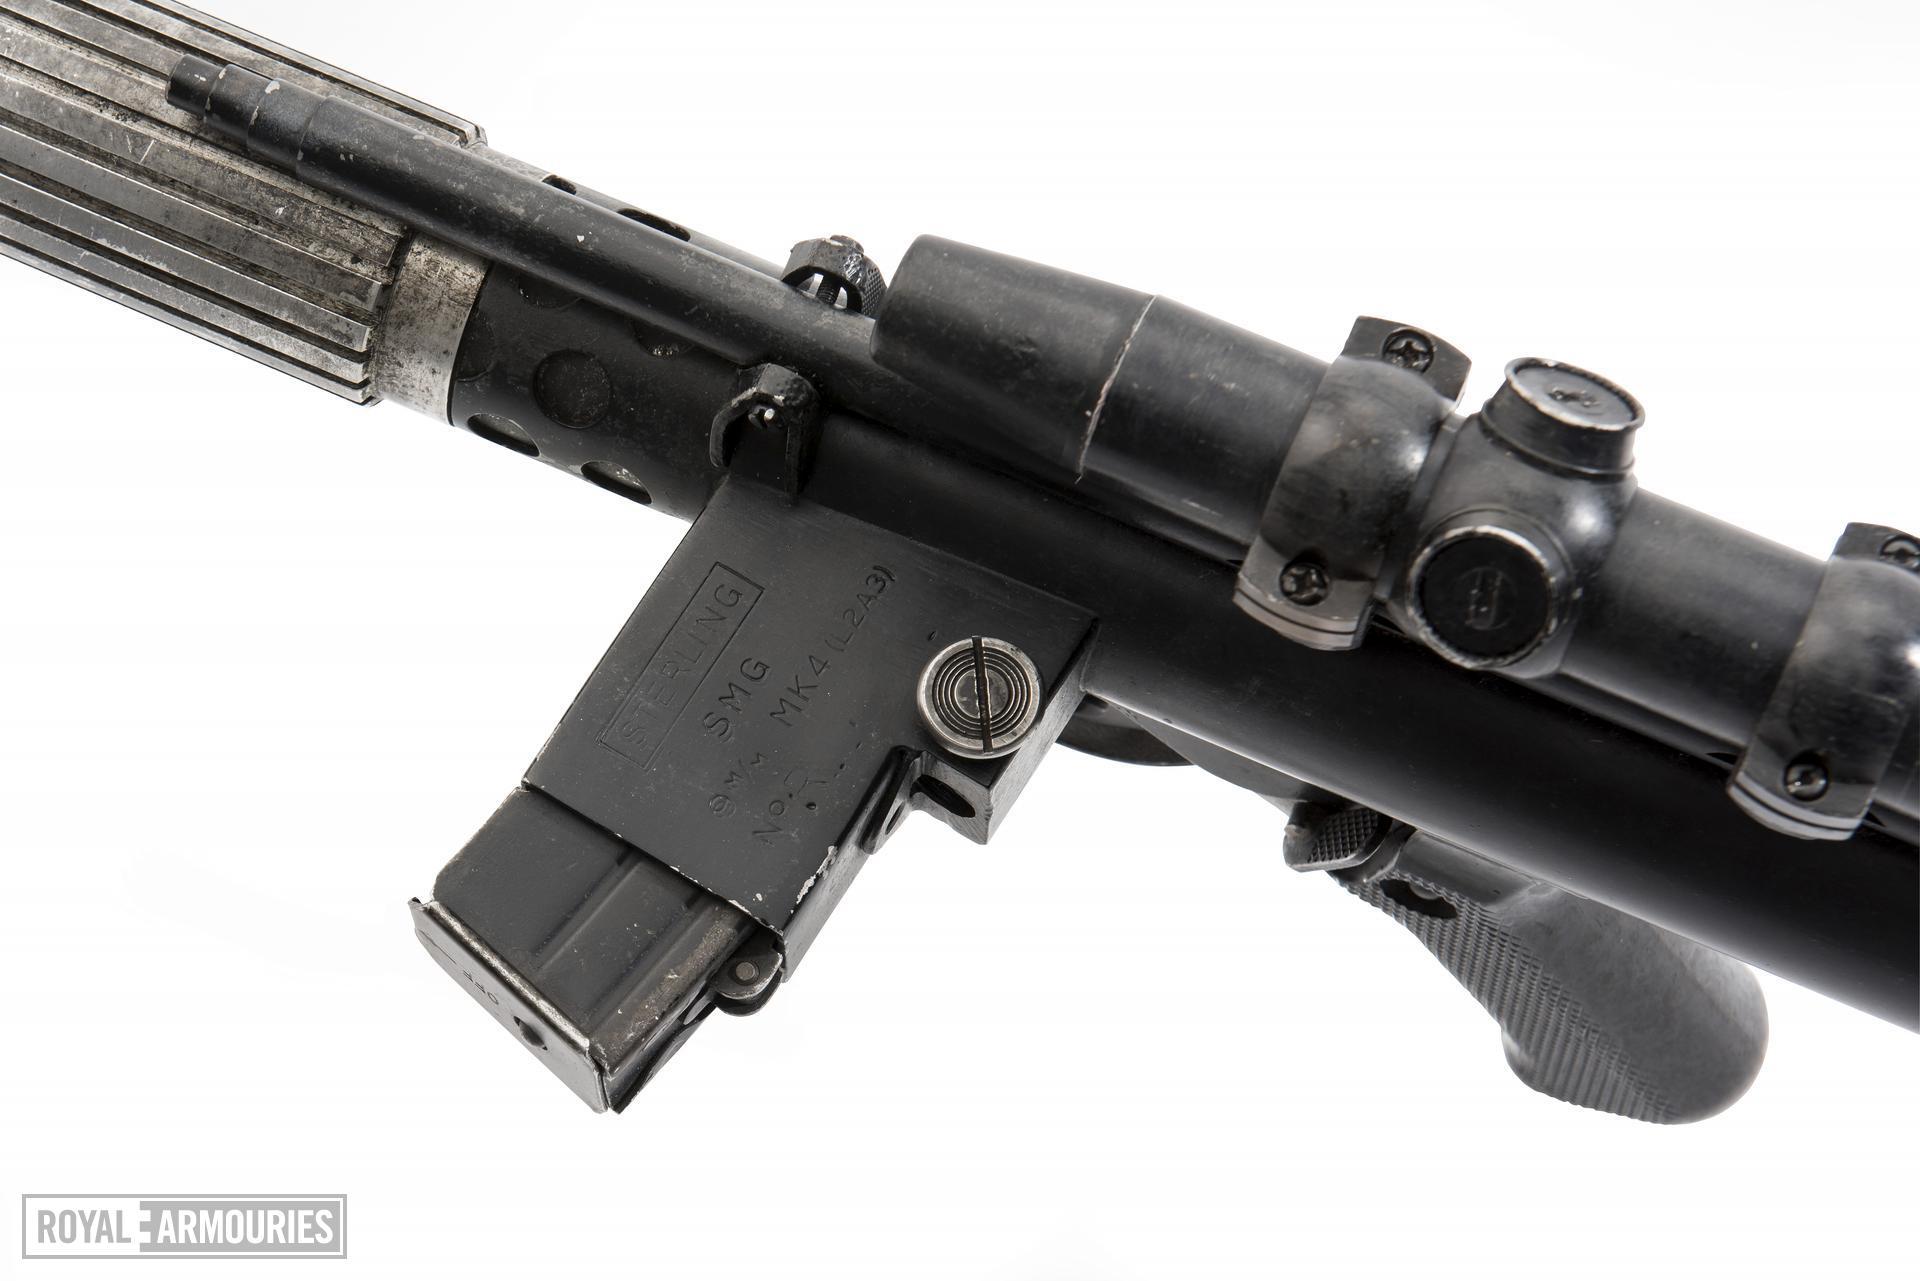 Rebel Blaster from the movie Star Wars